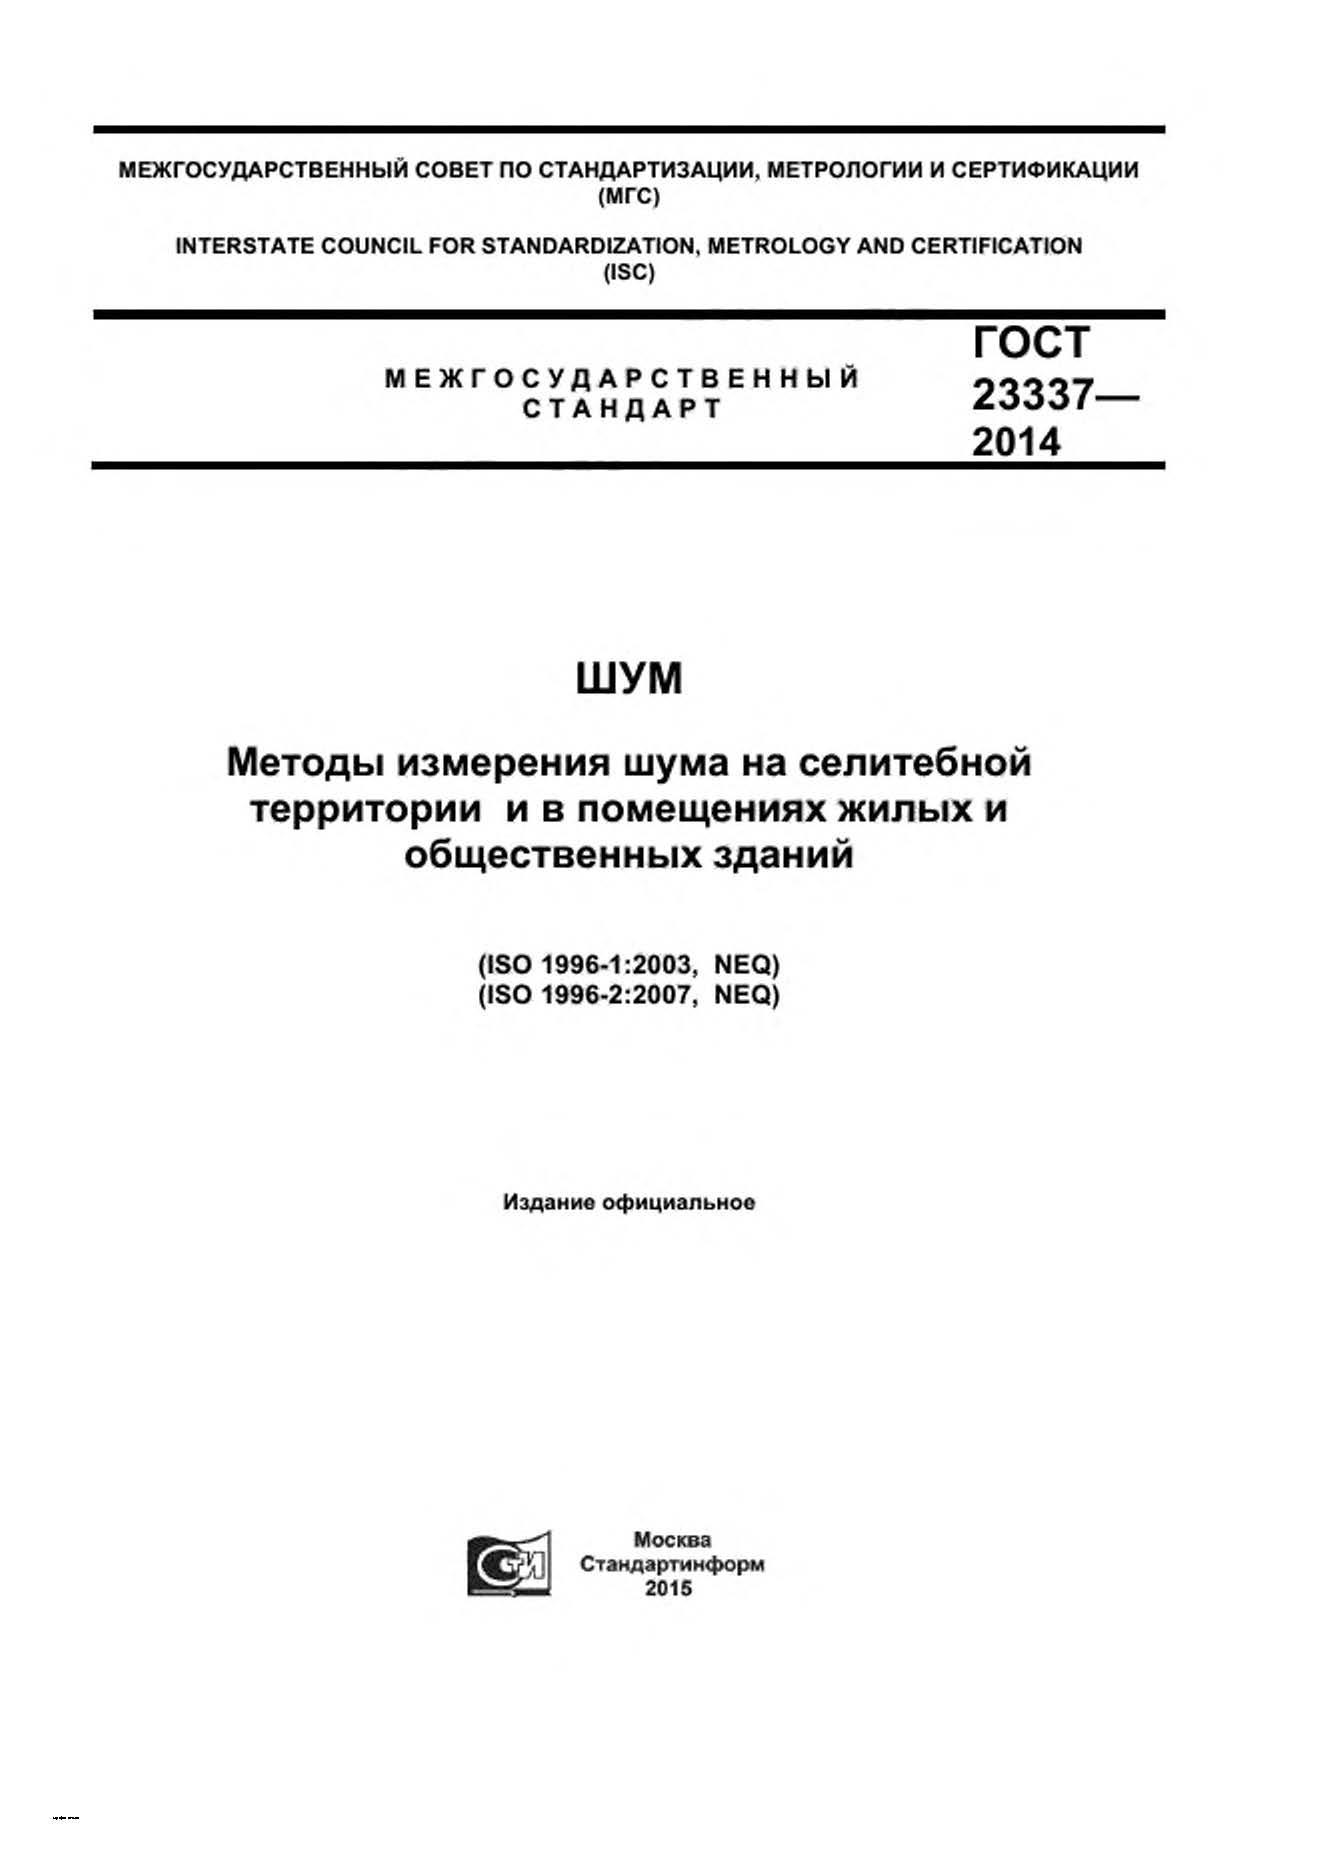 ГОСТ 23337-2014